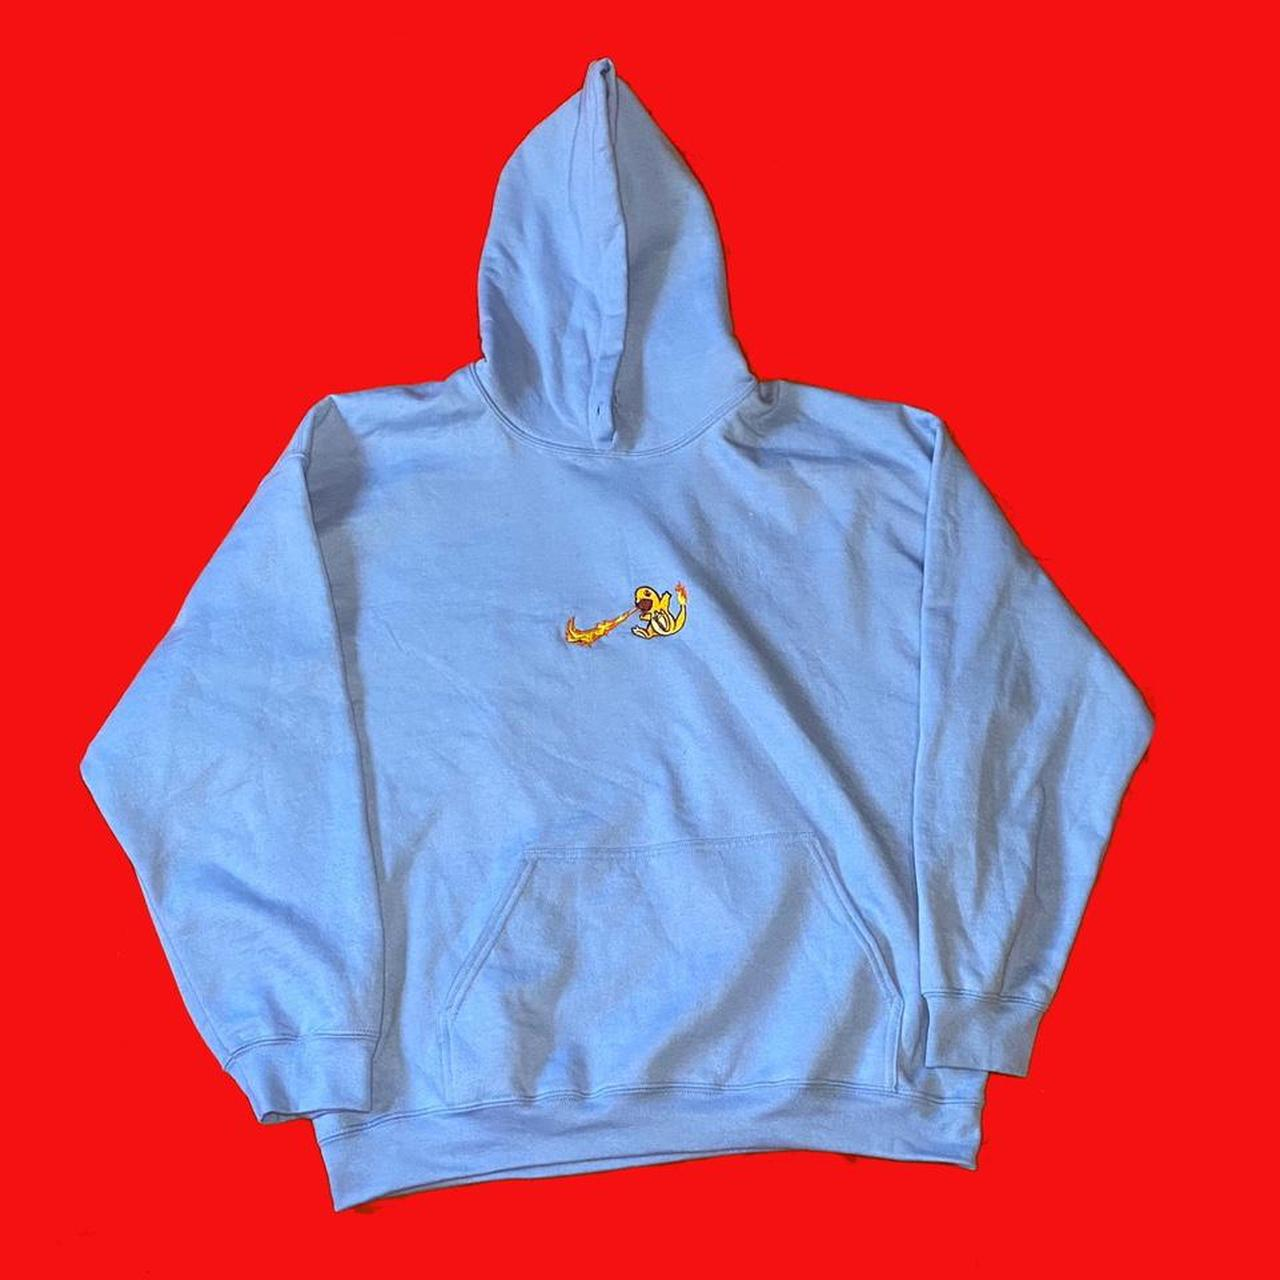 Product Image 1 - Charmander X Nike (Embroidery hoodie)